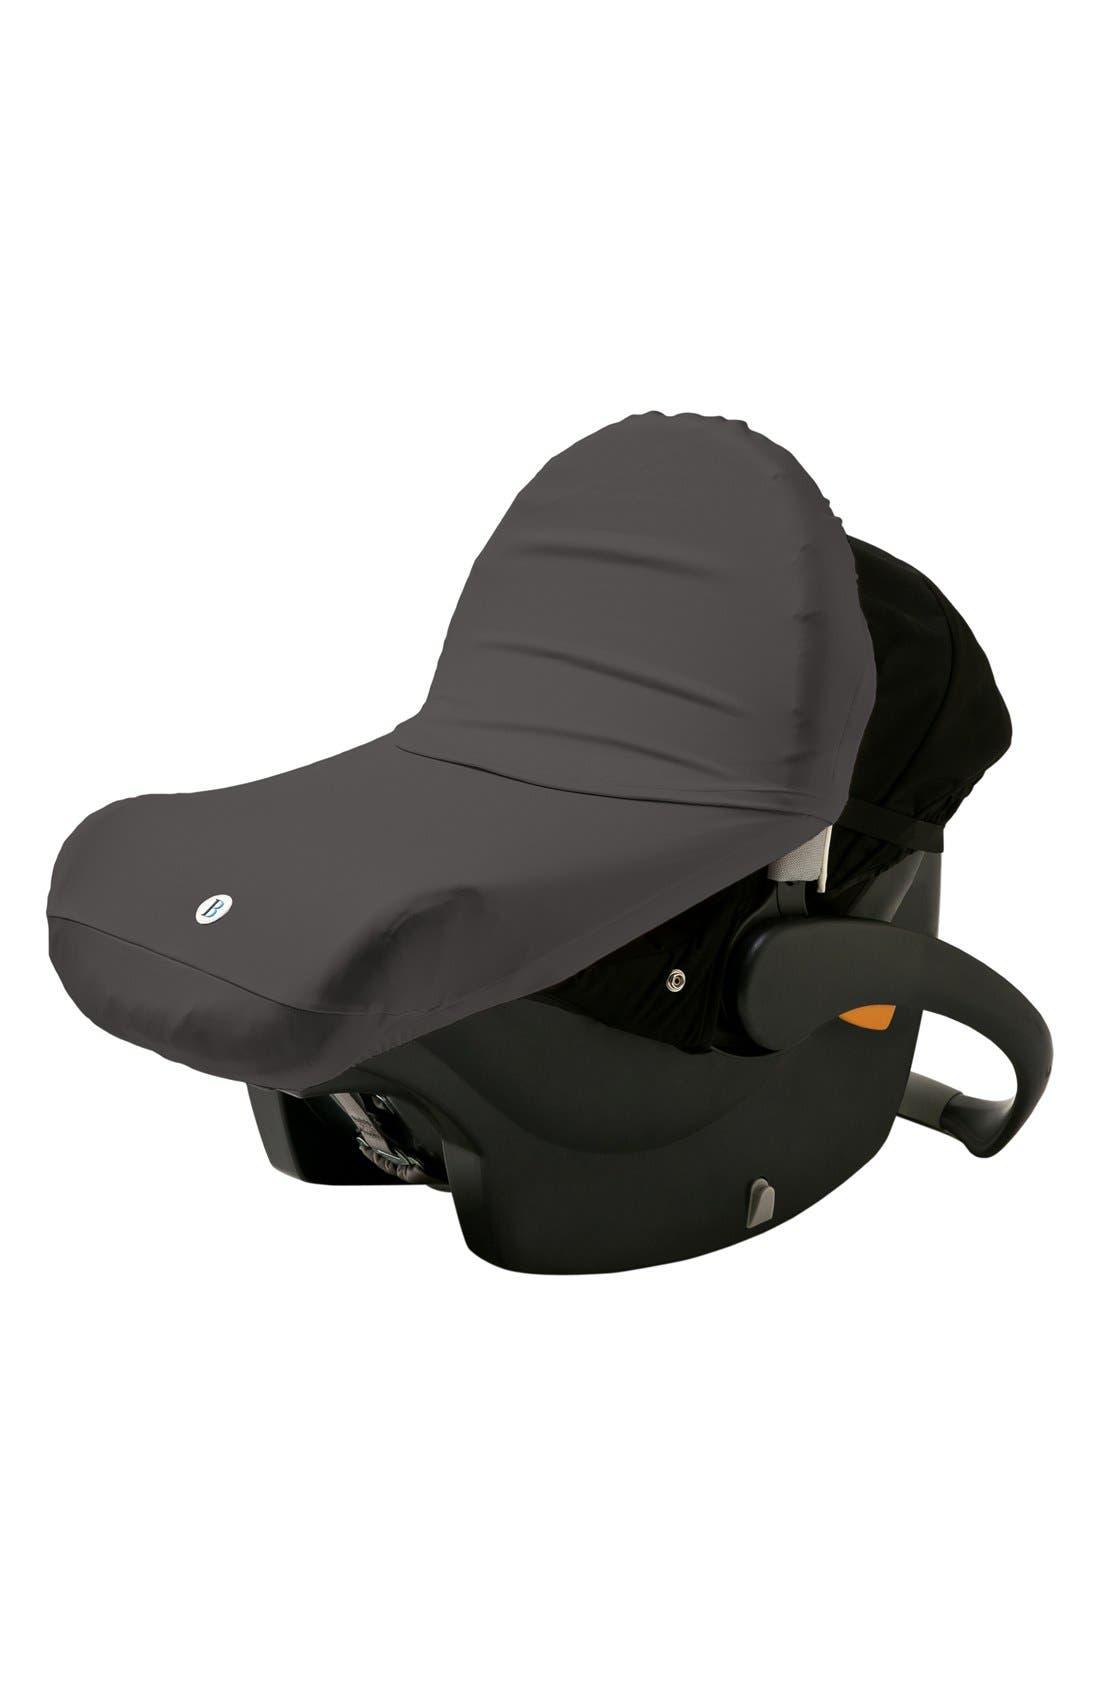 Main Image - Imagine Baby 'The Shade' Car Seat Canopy